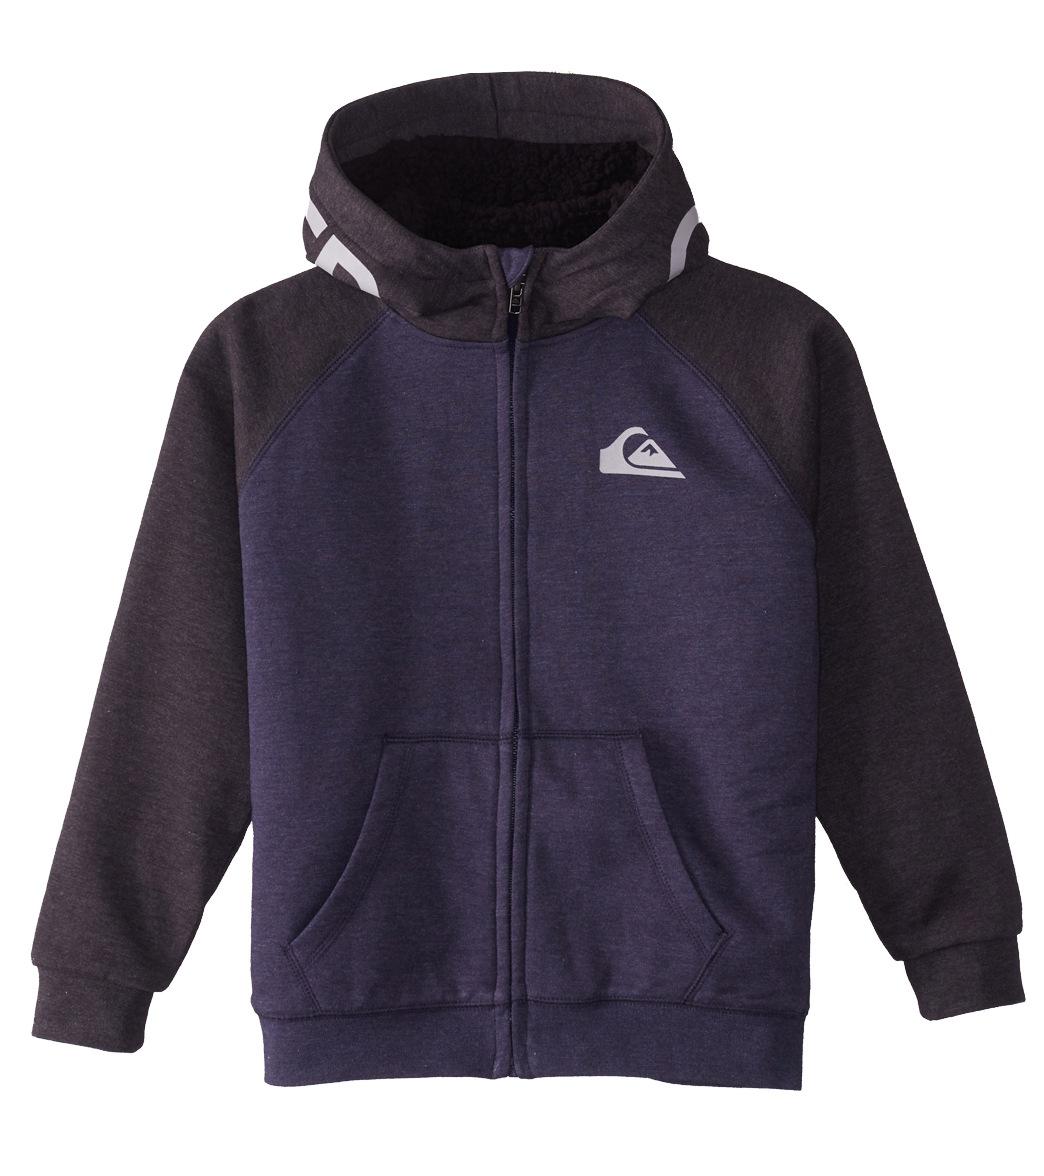 ce6efb4e1 Quiksilver Boys  Juwa Sherpa Zip hoodie (Big Kid) at SwimOutlet.com ...